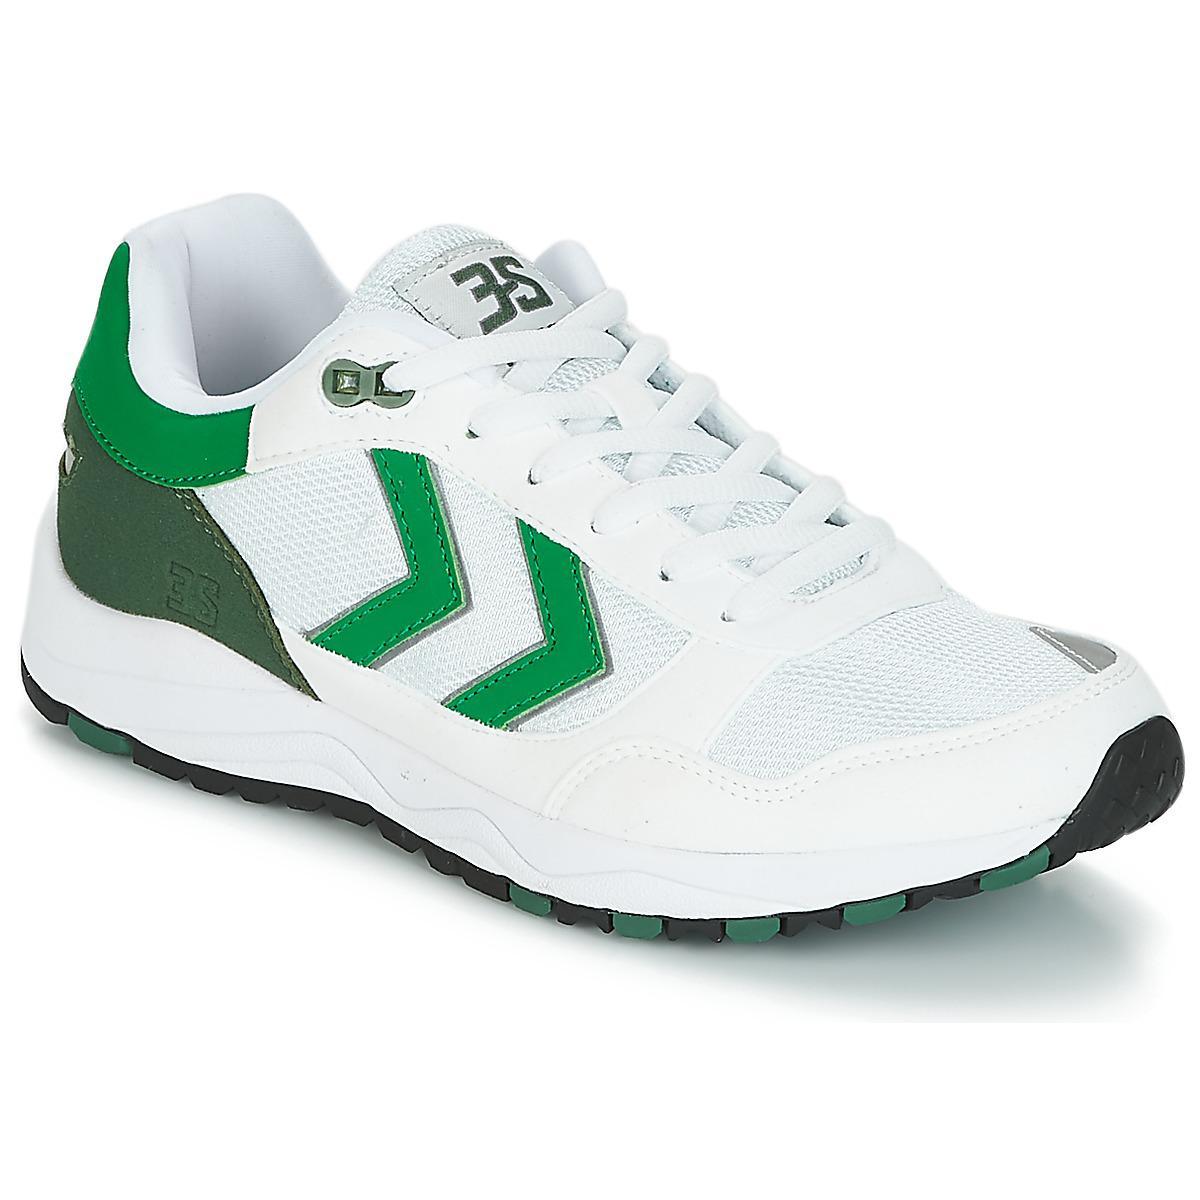 Hummel. Women's White 3-s Sport Shoes ...